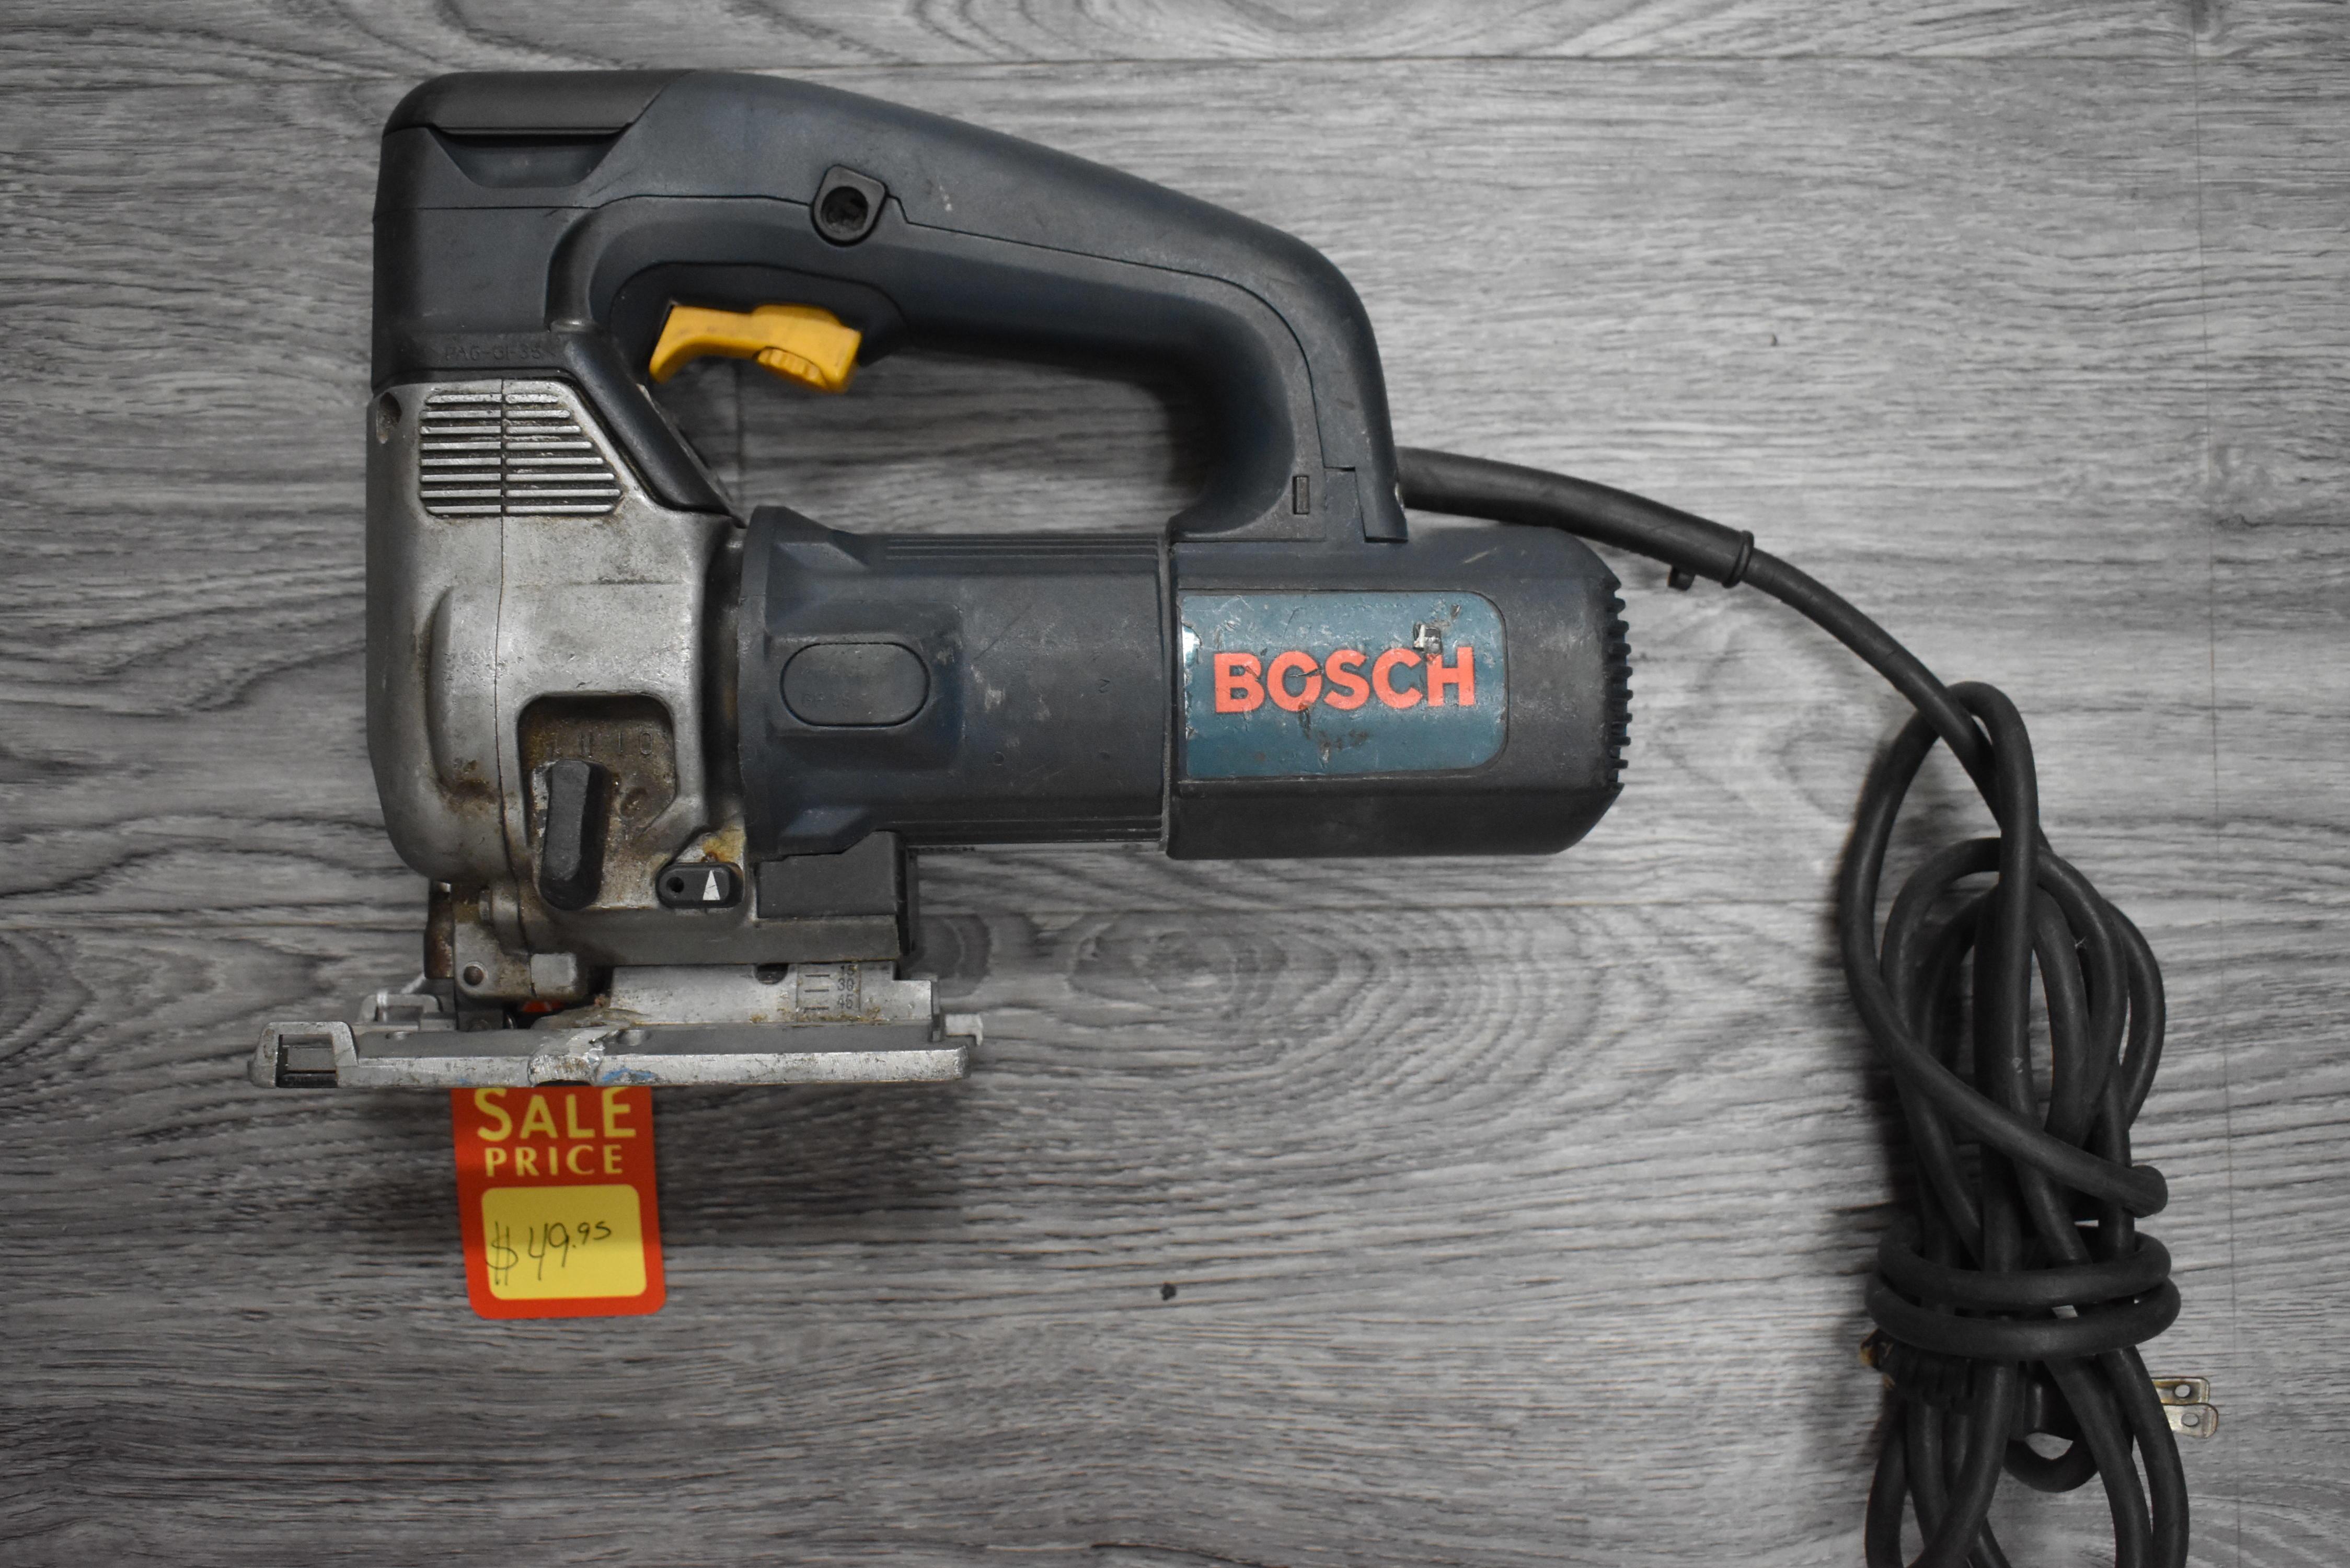 BOSCH - 1587AVS - JIG SAW TOOLS-POWER